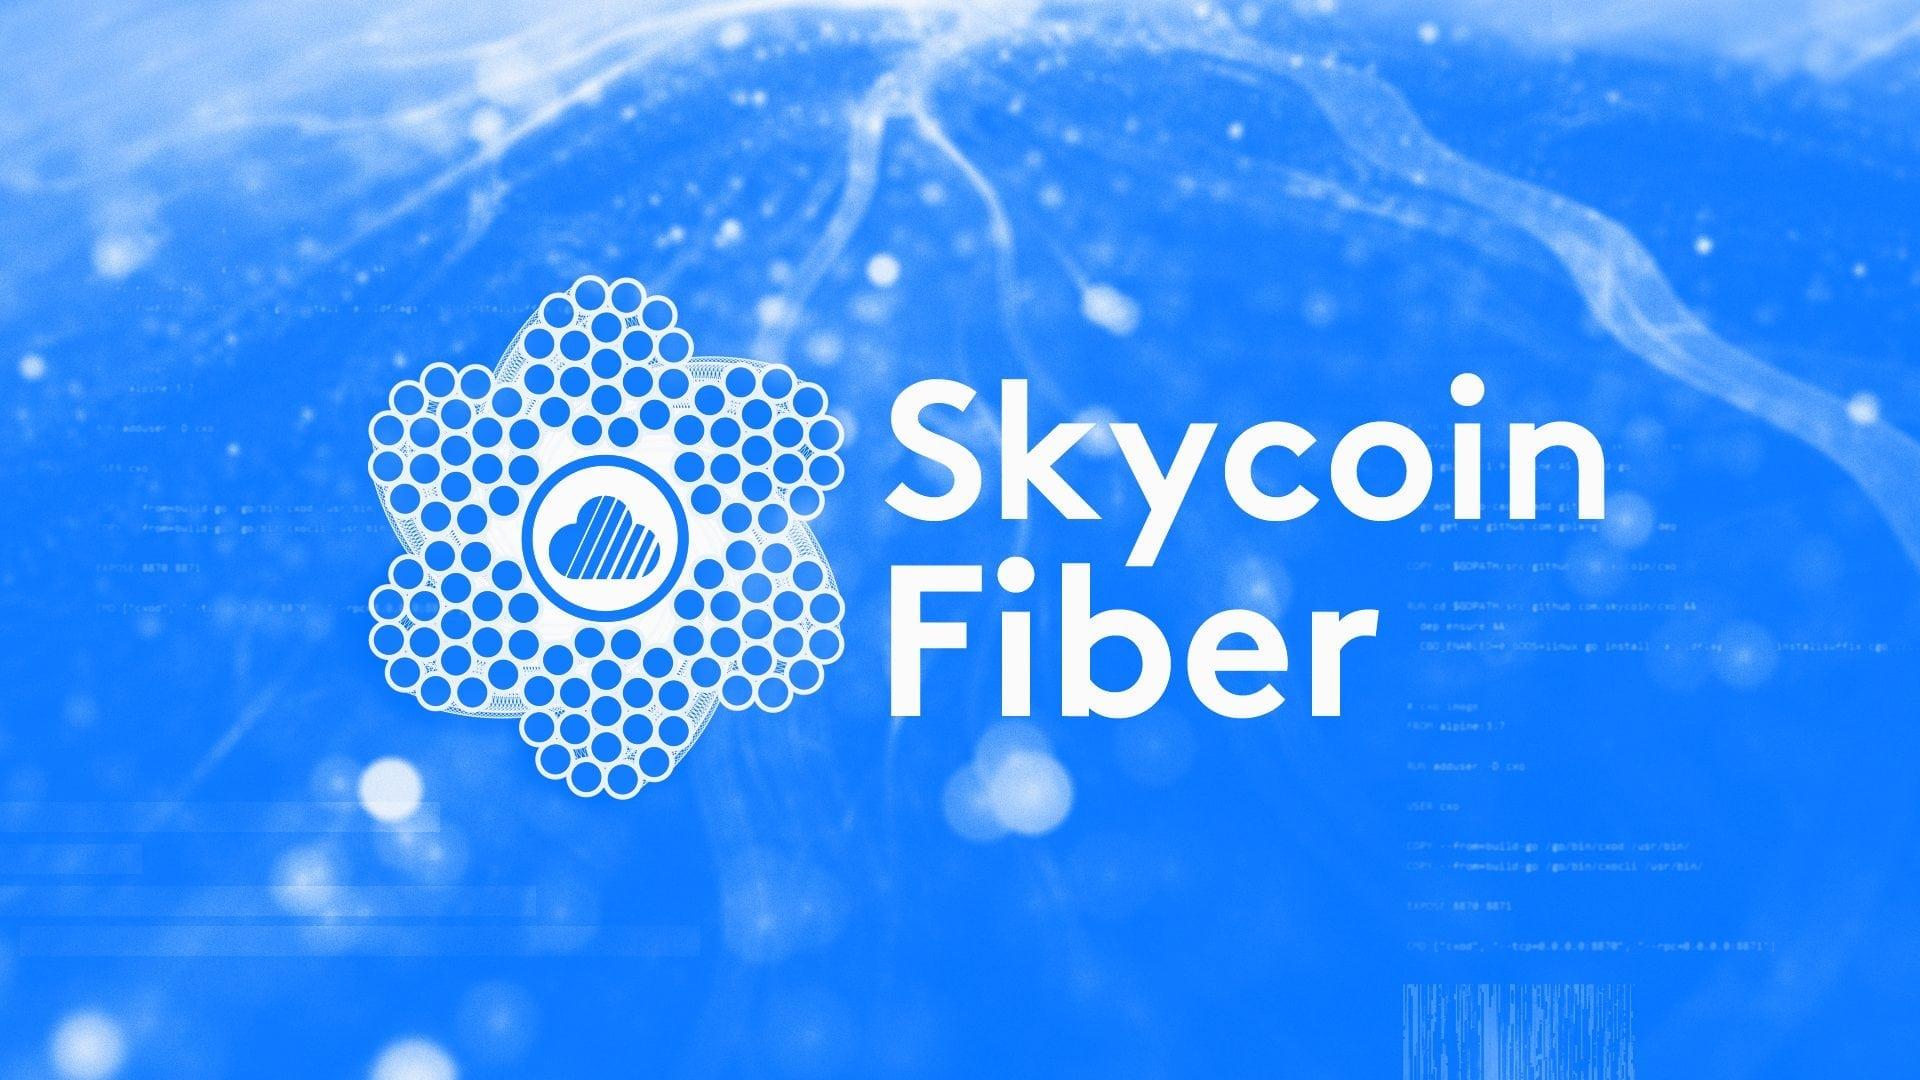 skycoin fiber - Skycoin Blockchain Company Wants To Emerge On The South Korean Market